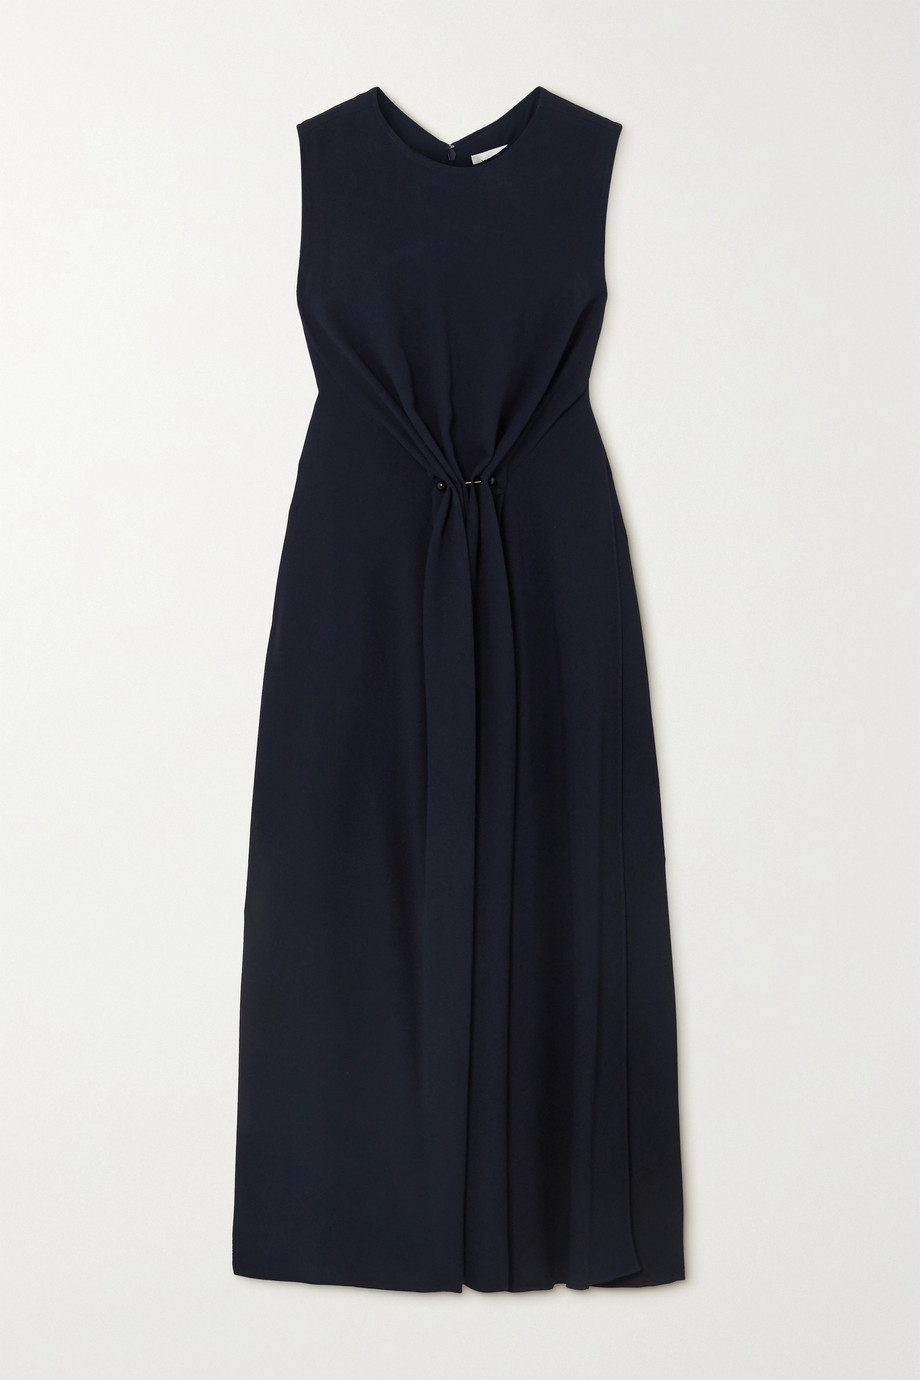 Victoria Beckham Gathered cady midi dress